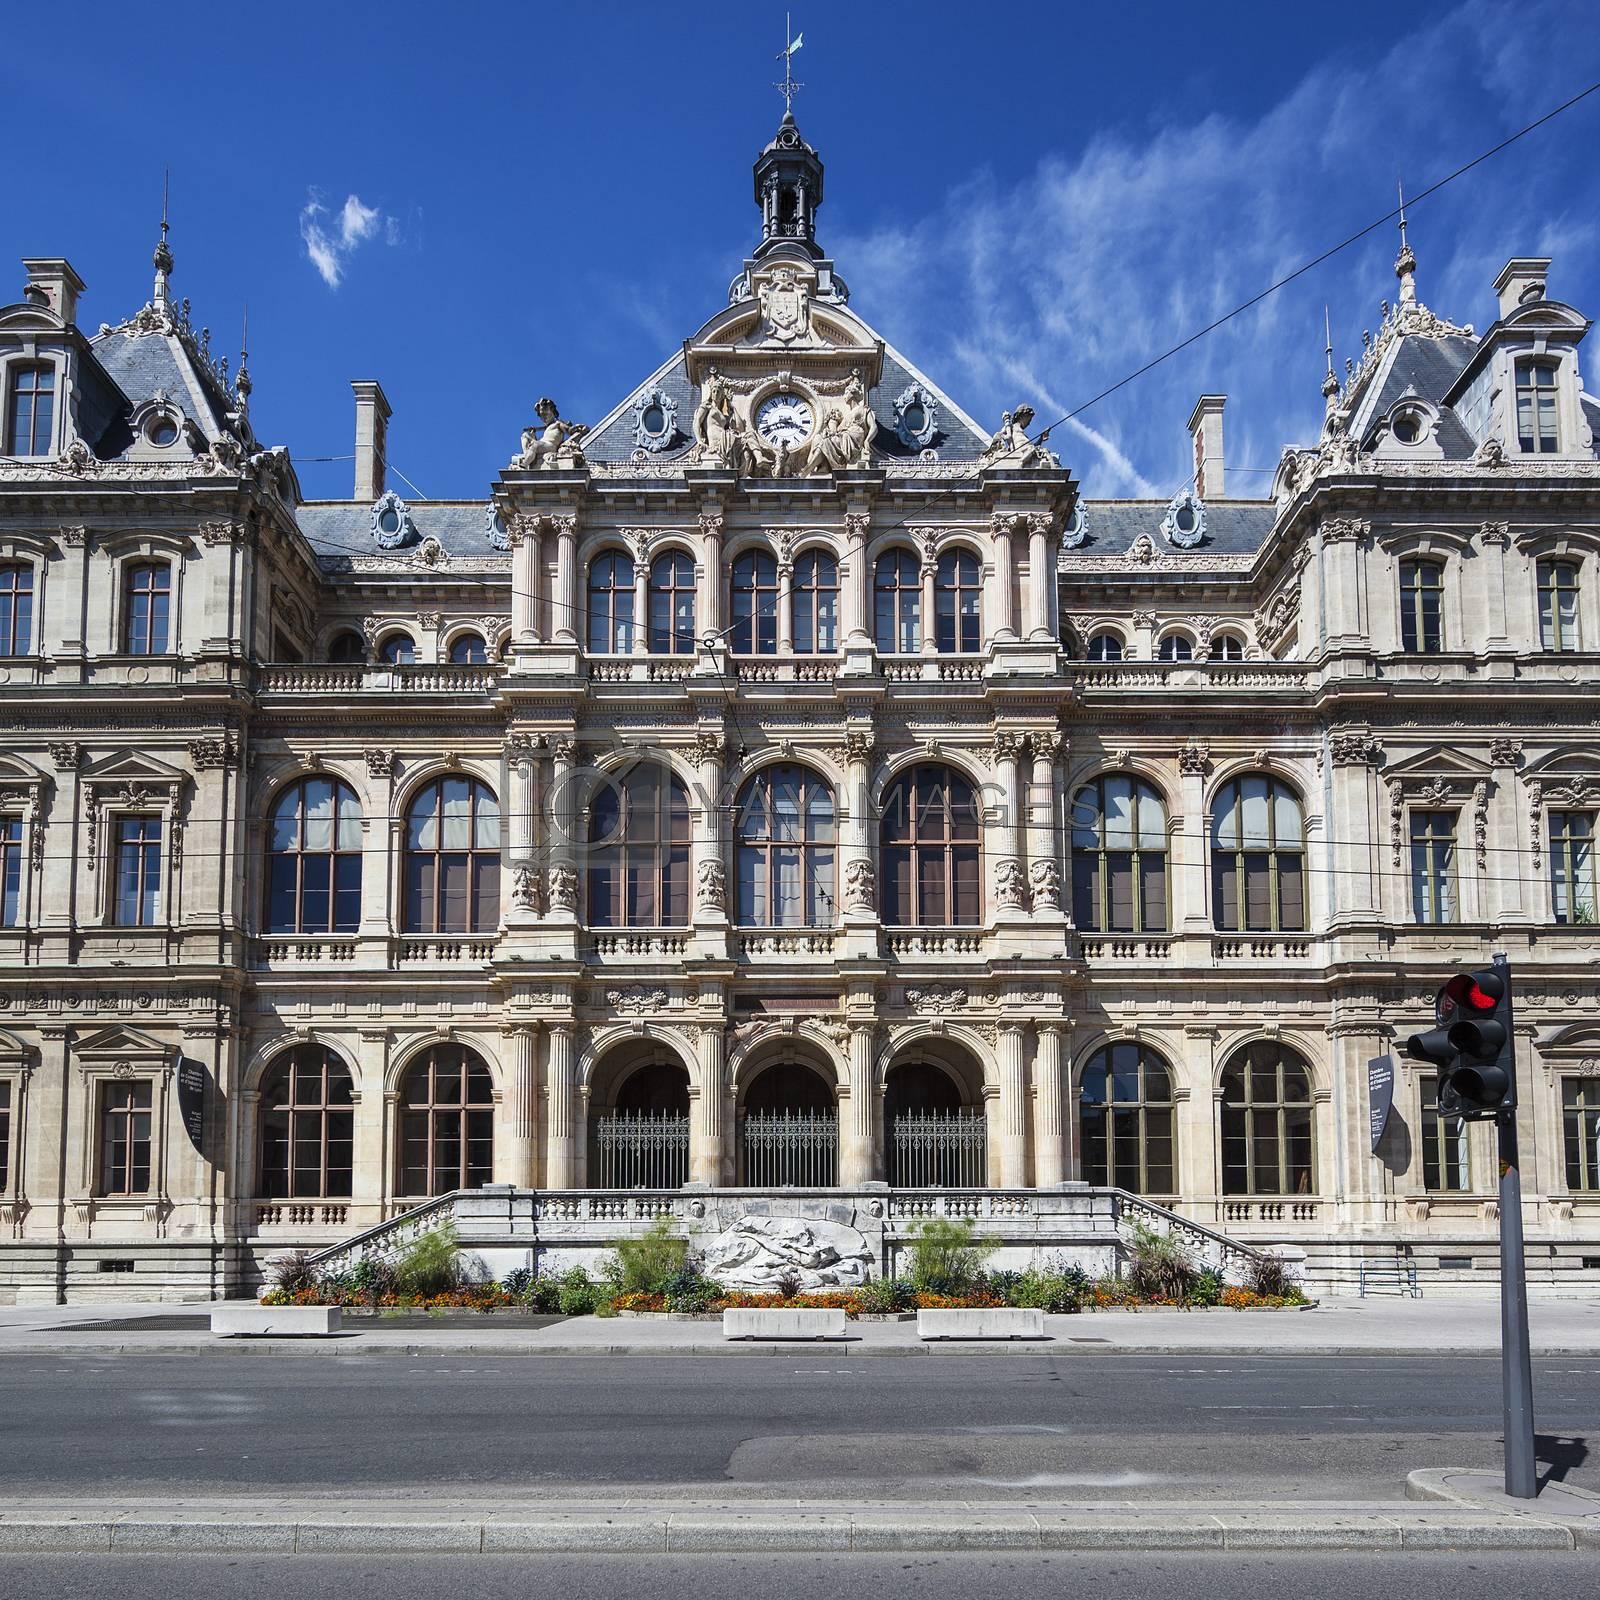 Royalty free image of Palais de la bourse by vwalakte